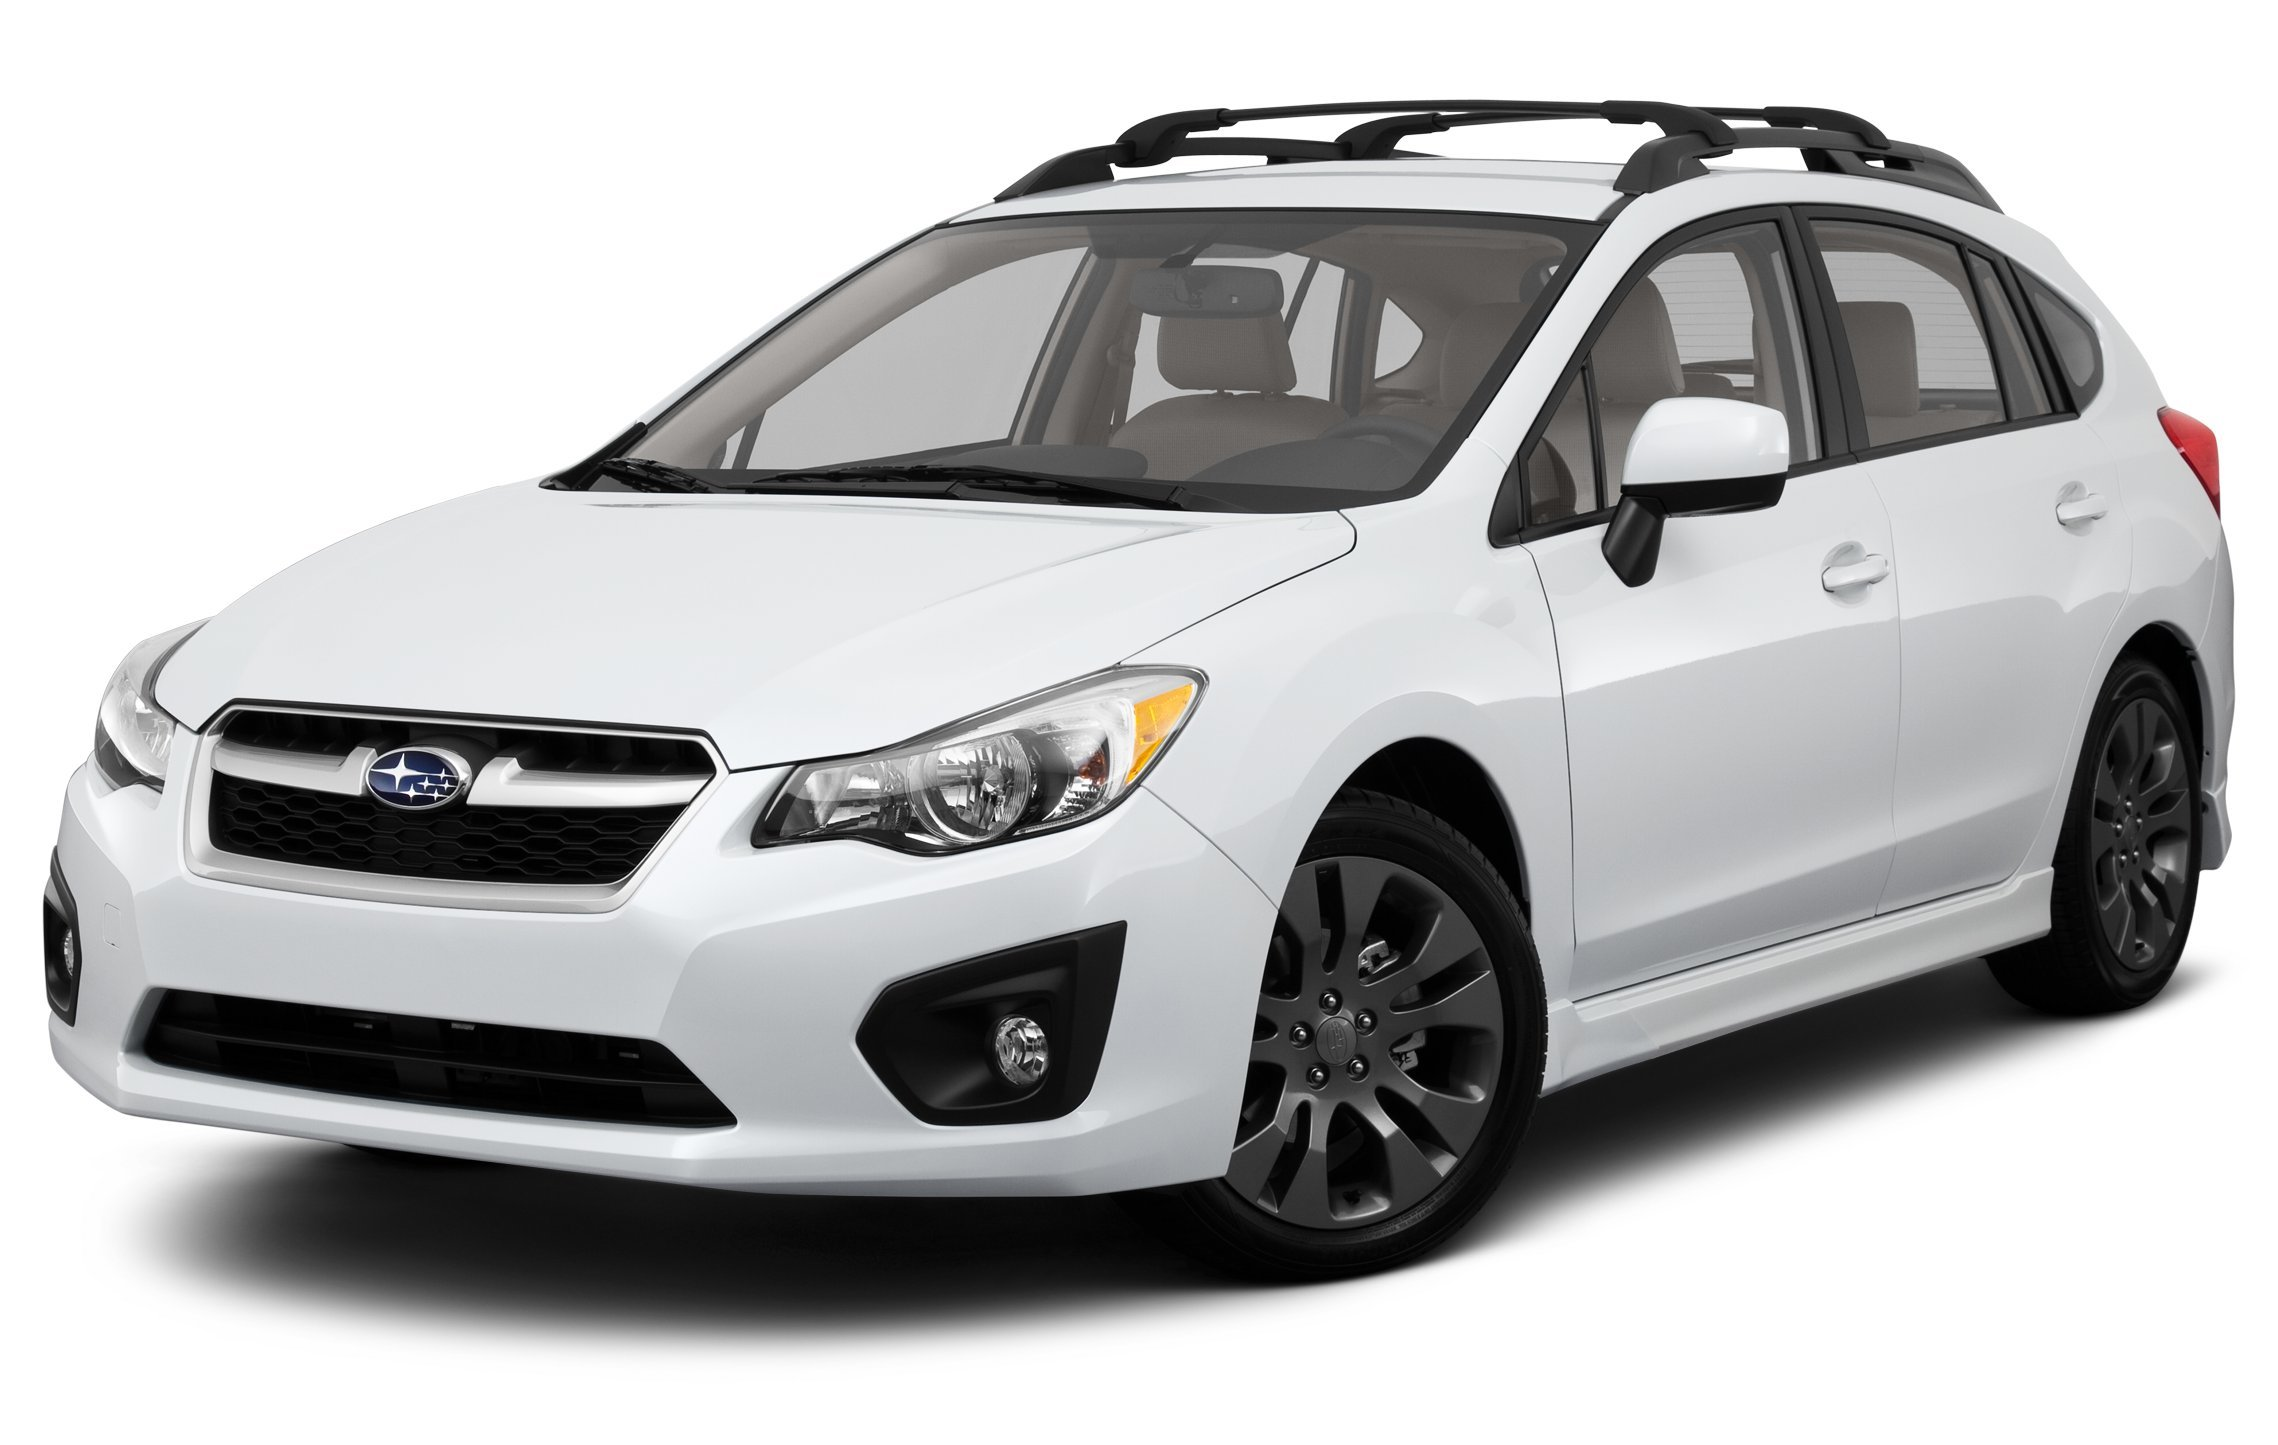 Amazon 2013 subaru outback reviews images and specs vehicles 2013 subaru impreza 20i sport limited 5 door automatic transmission vanachro Gallery